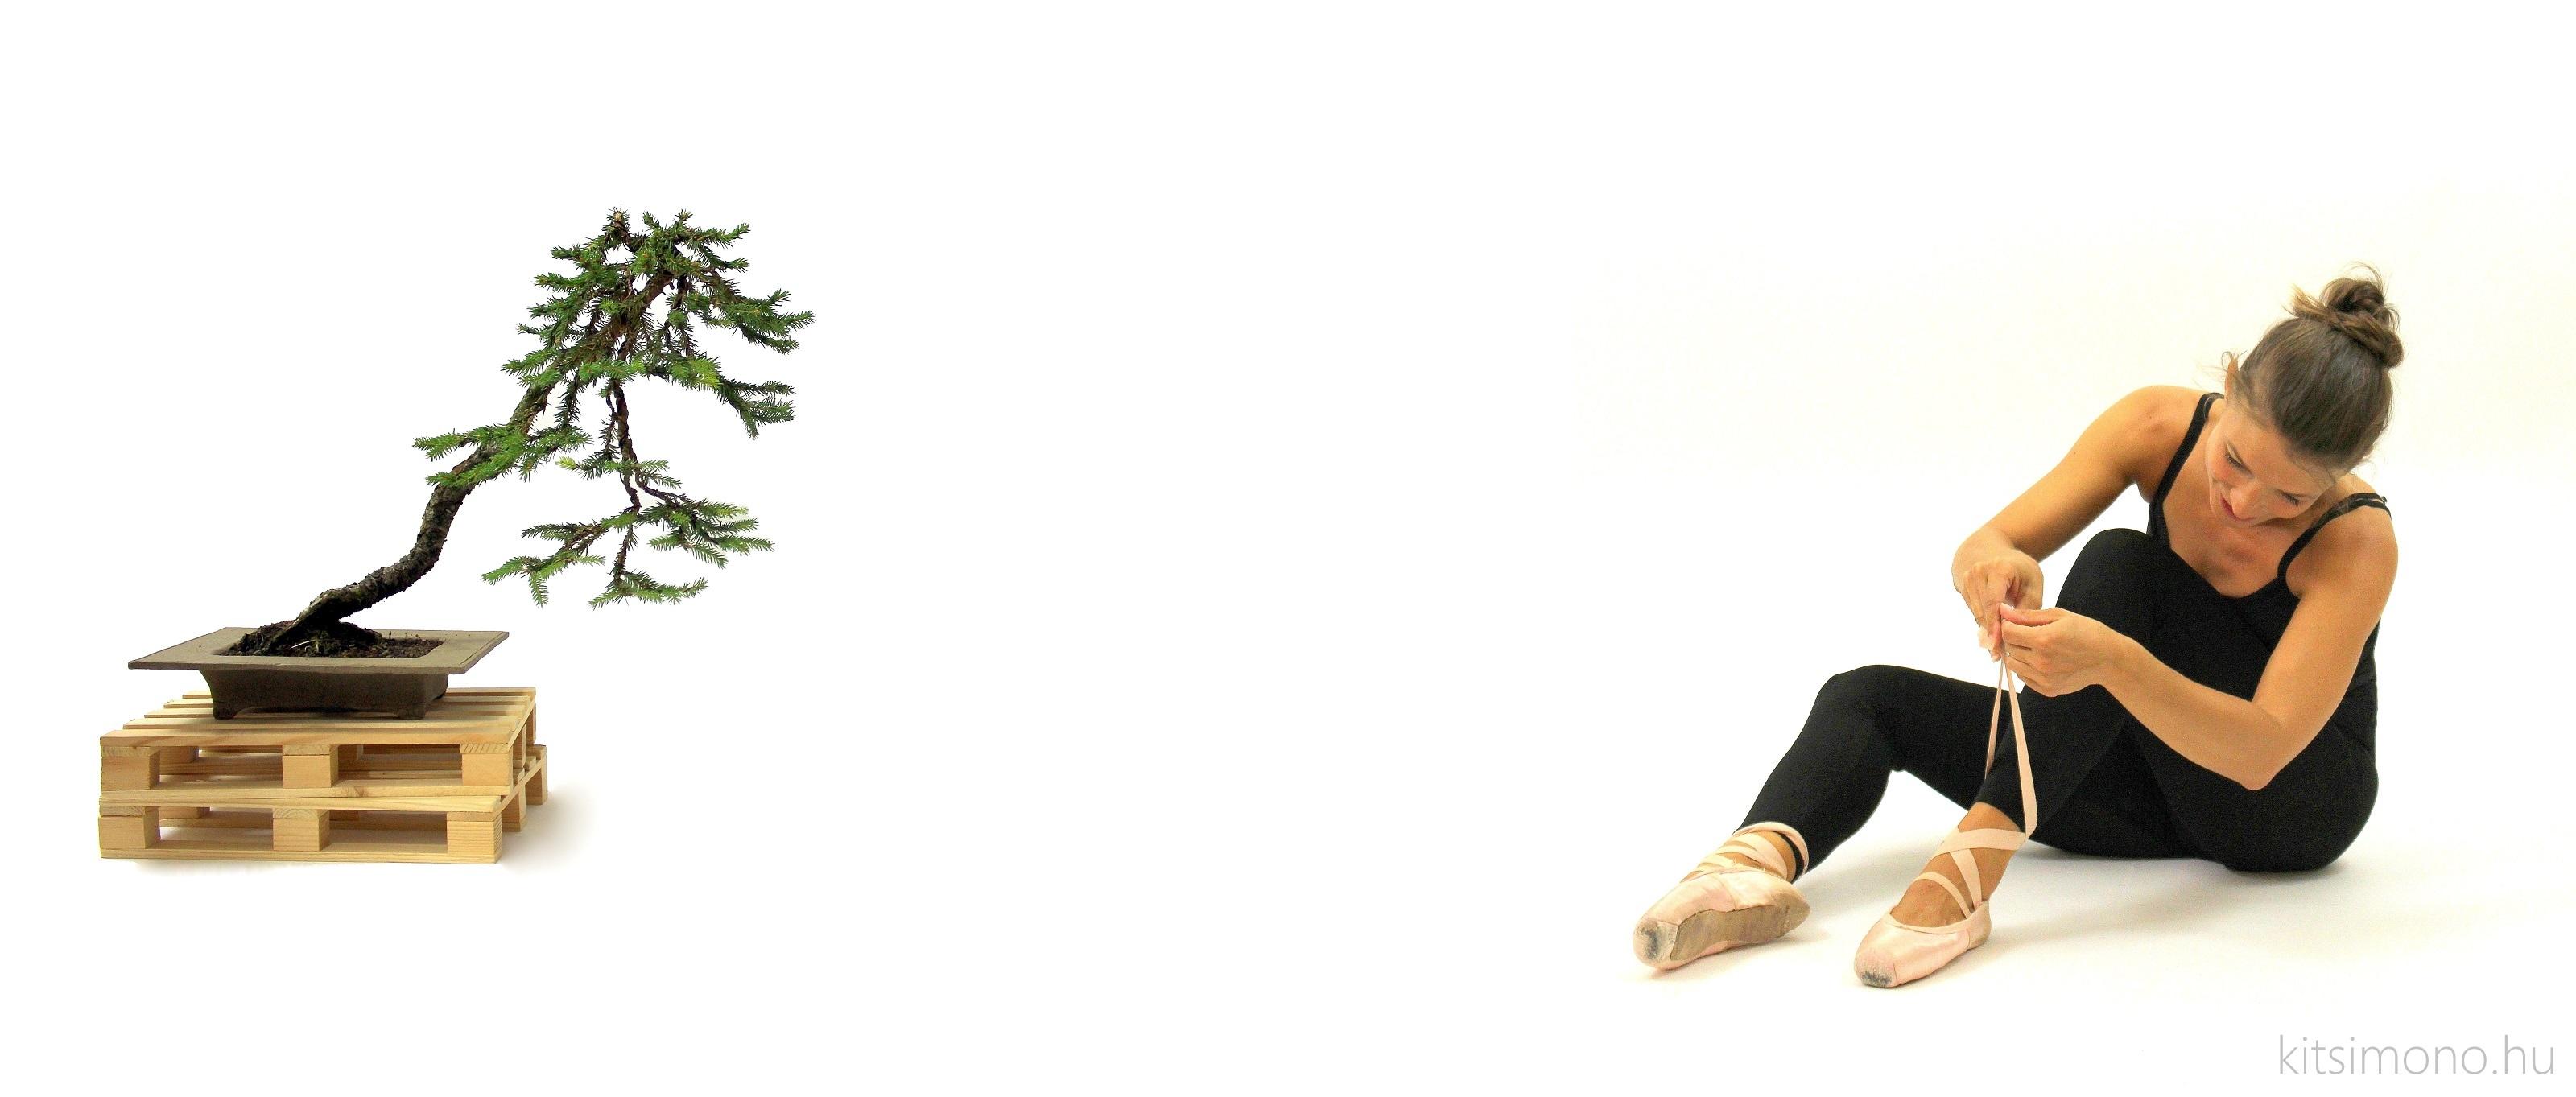 picea literati bunjin bonsai ballet kitsimono art experiments (10)